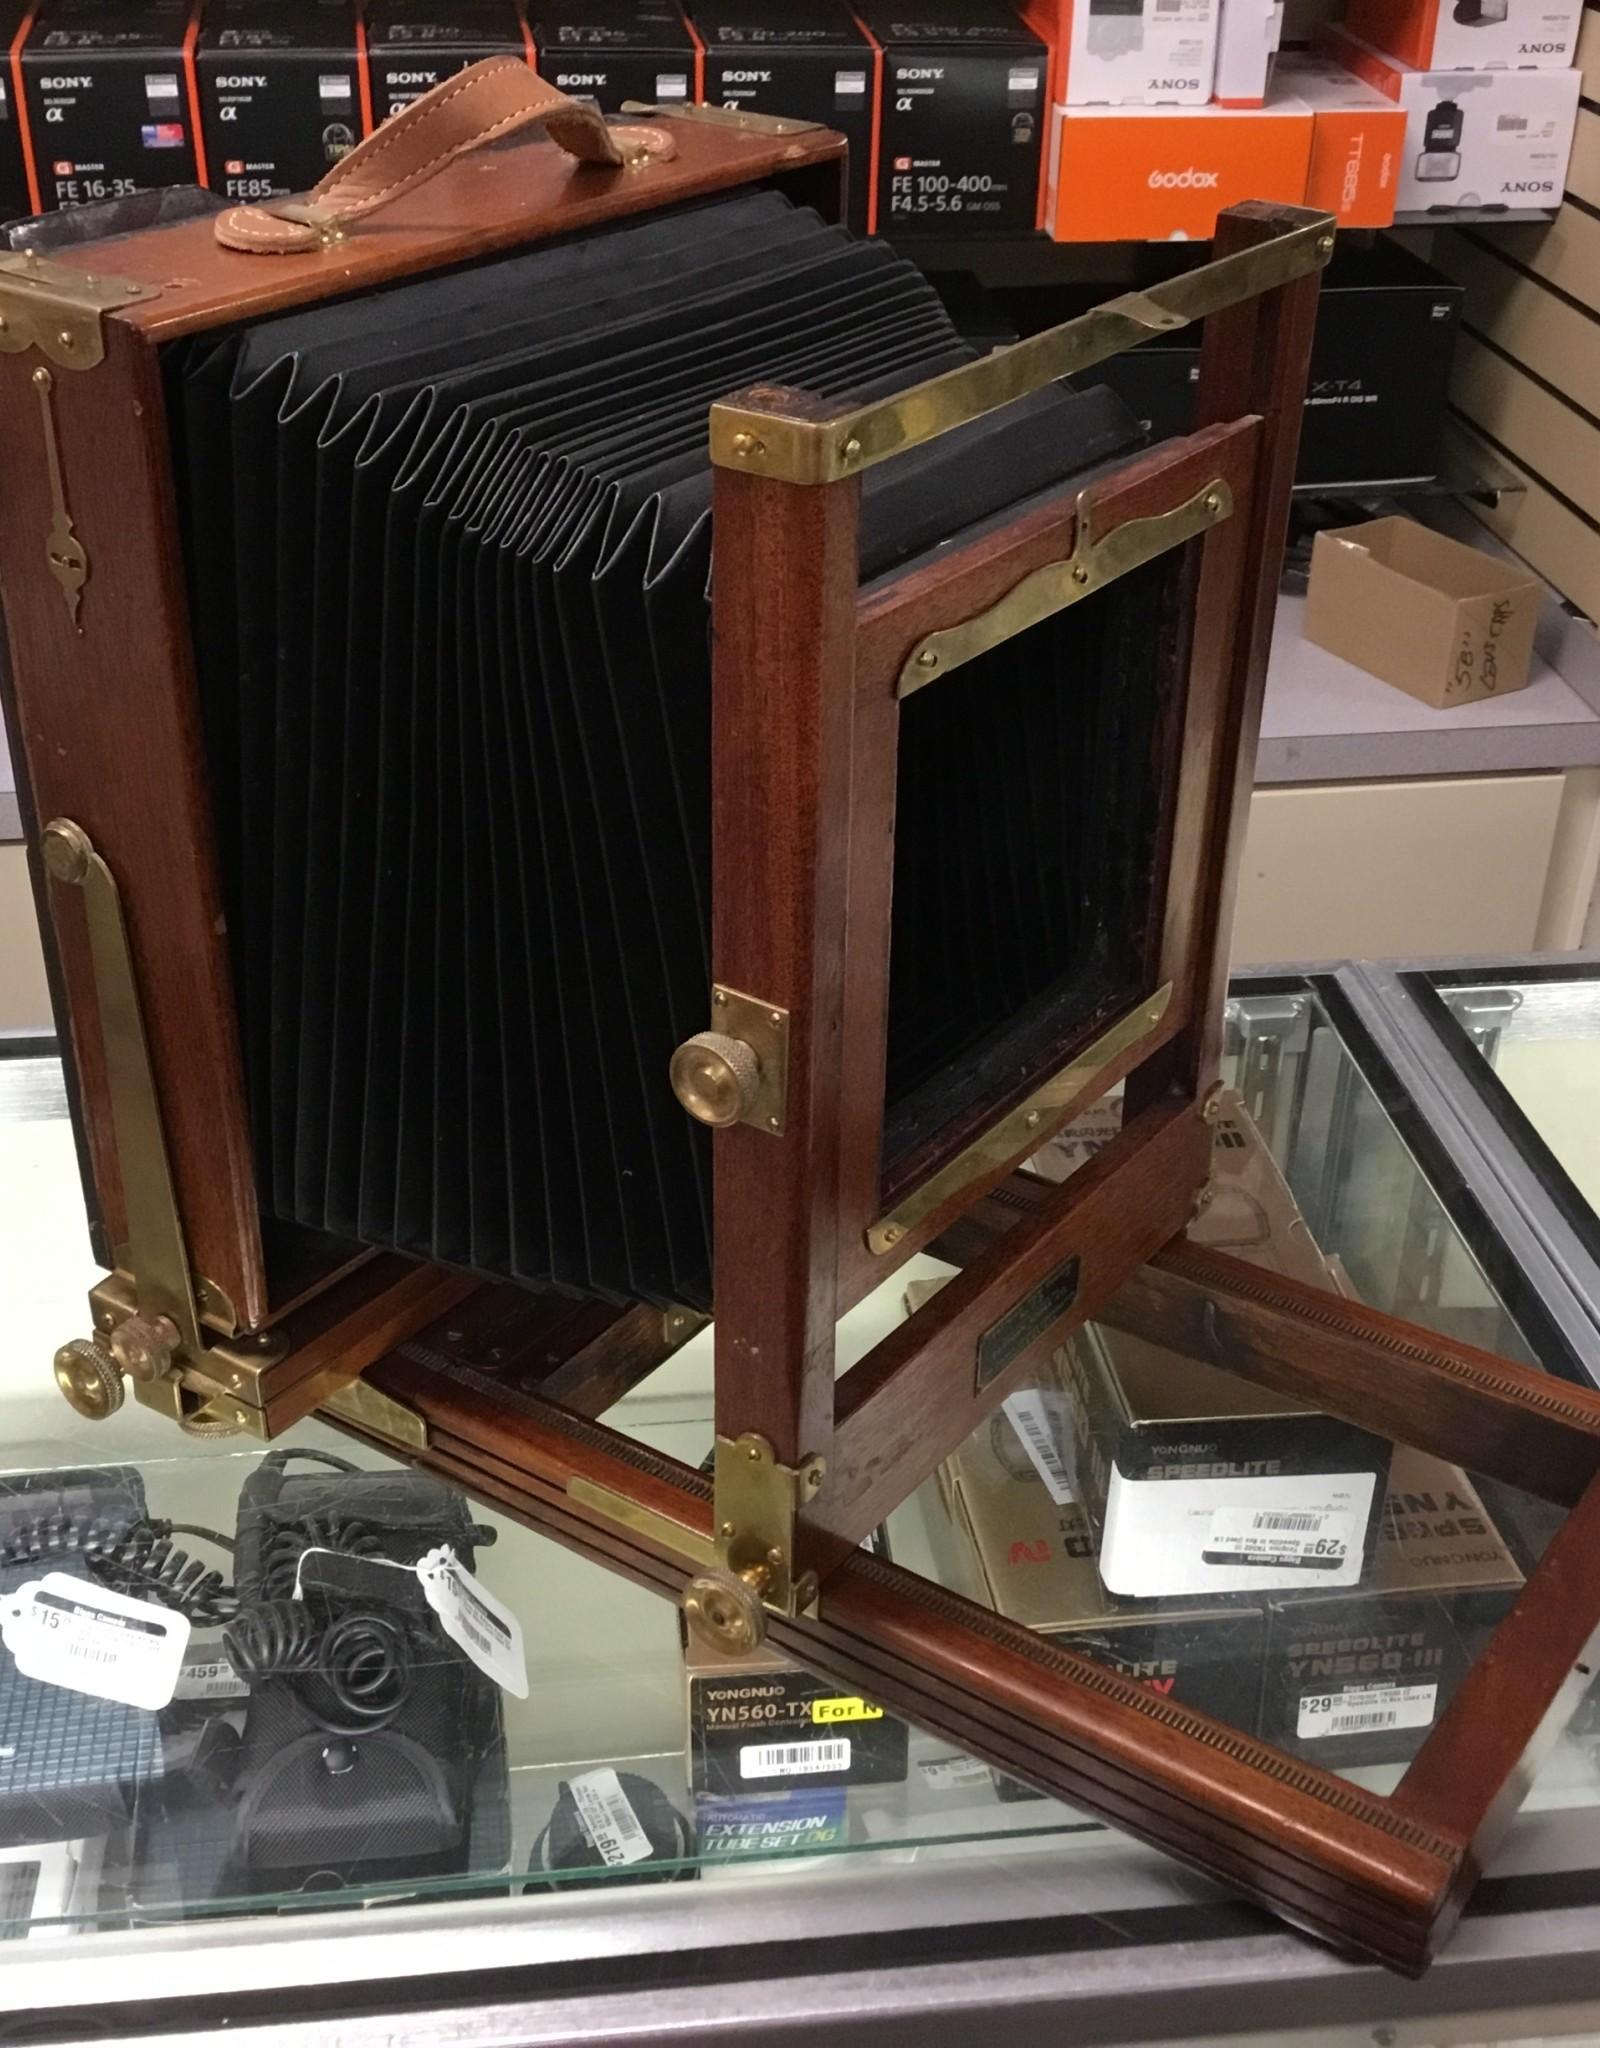 Kodak 2D Wood 8x10 Camera with Extension Rails Used EX